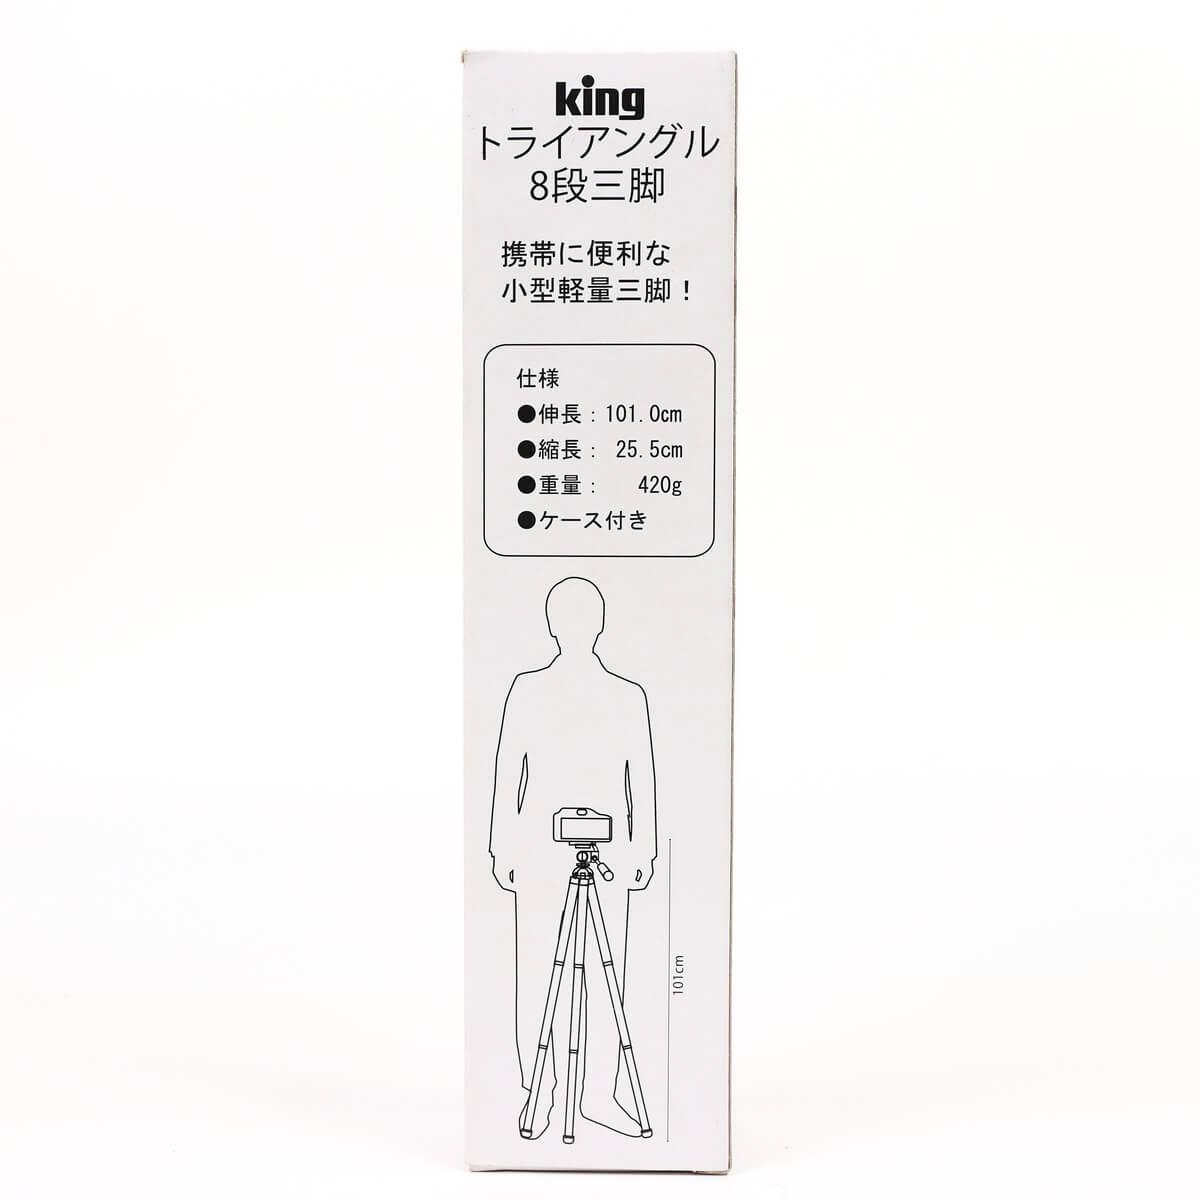 king トライアングル 8段三脚の箱